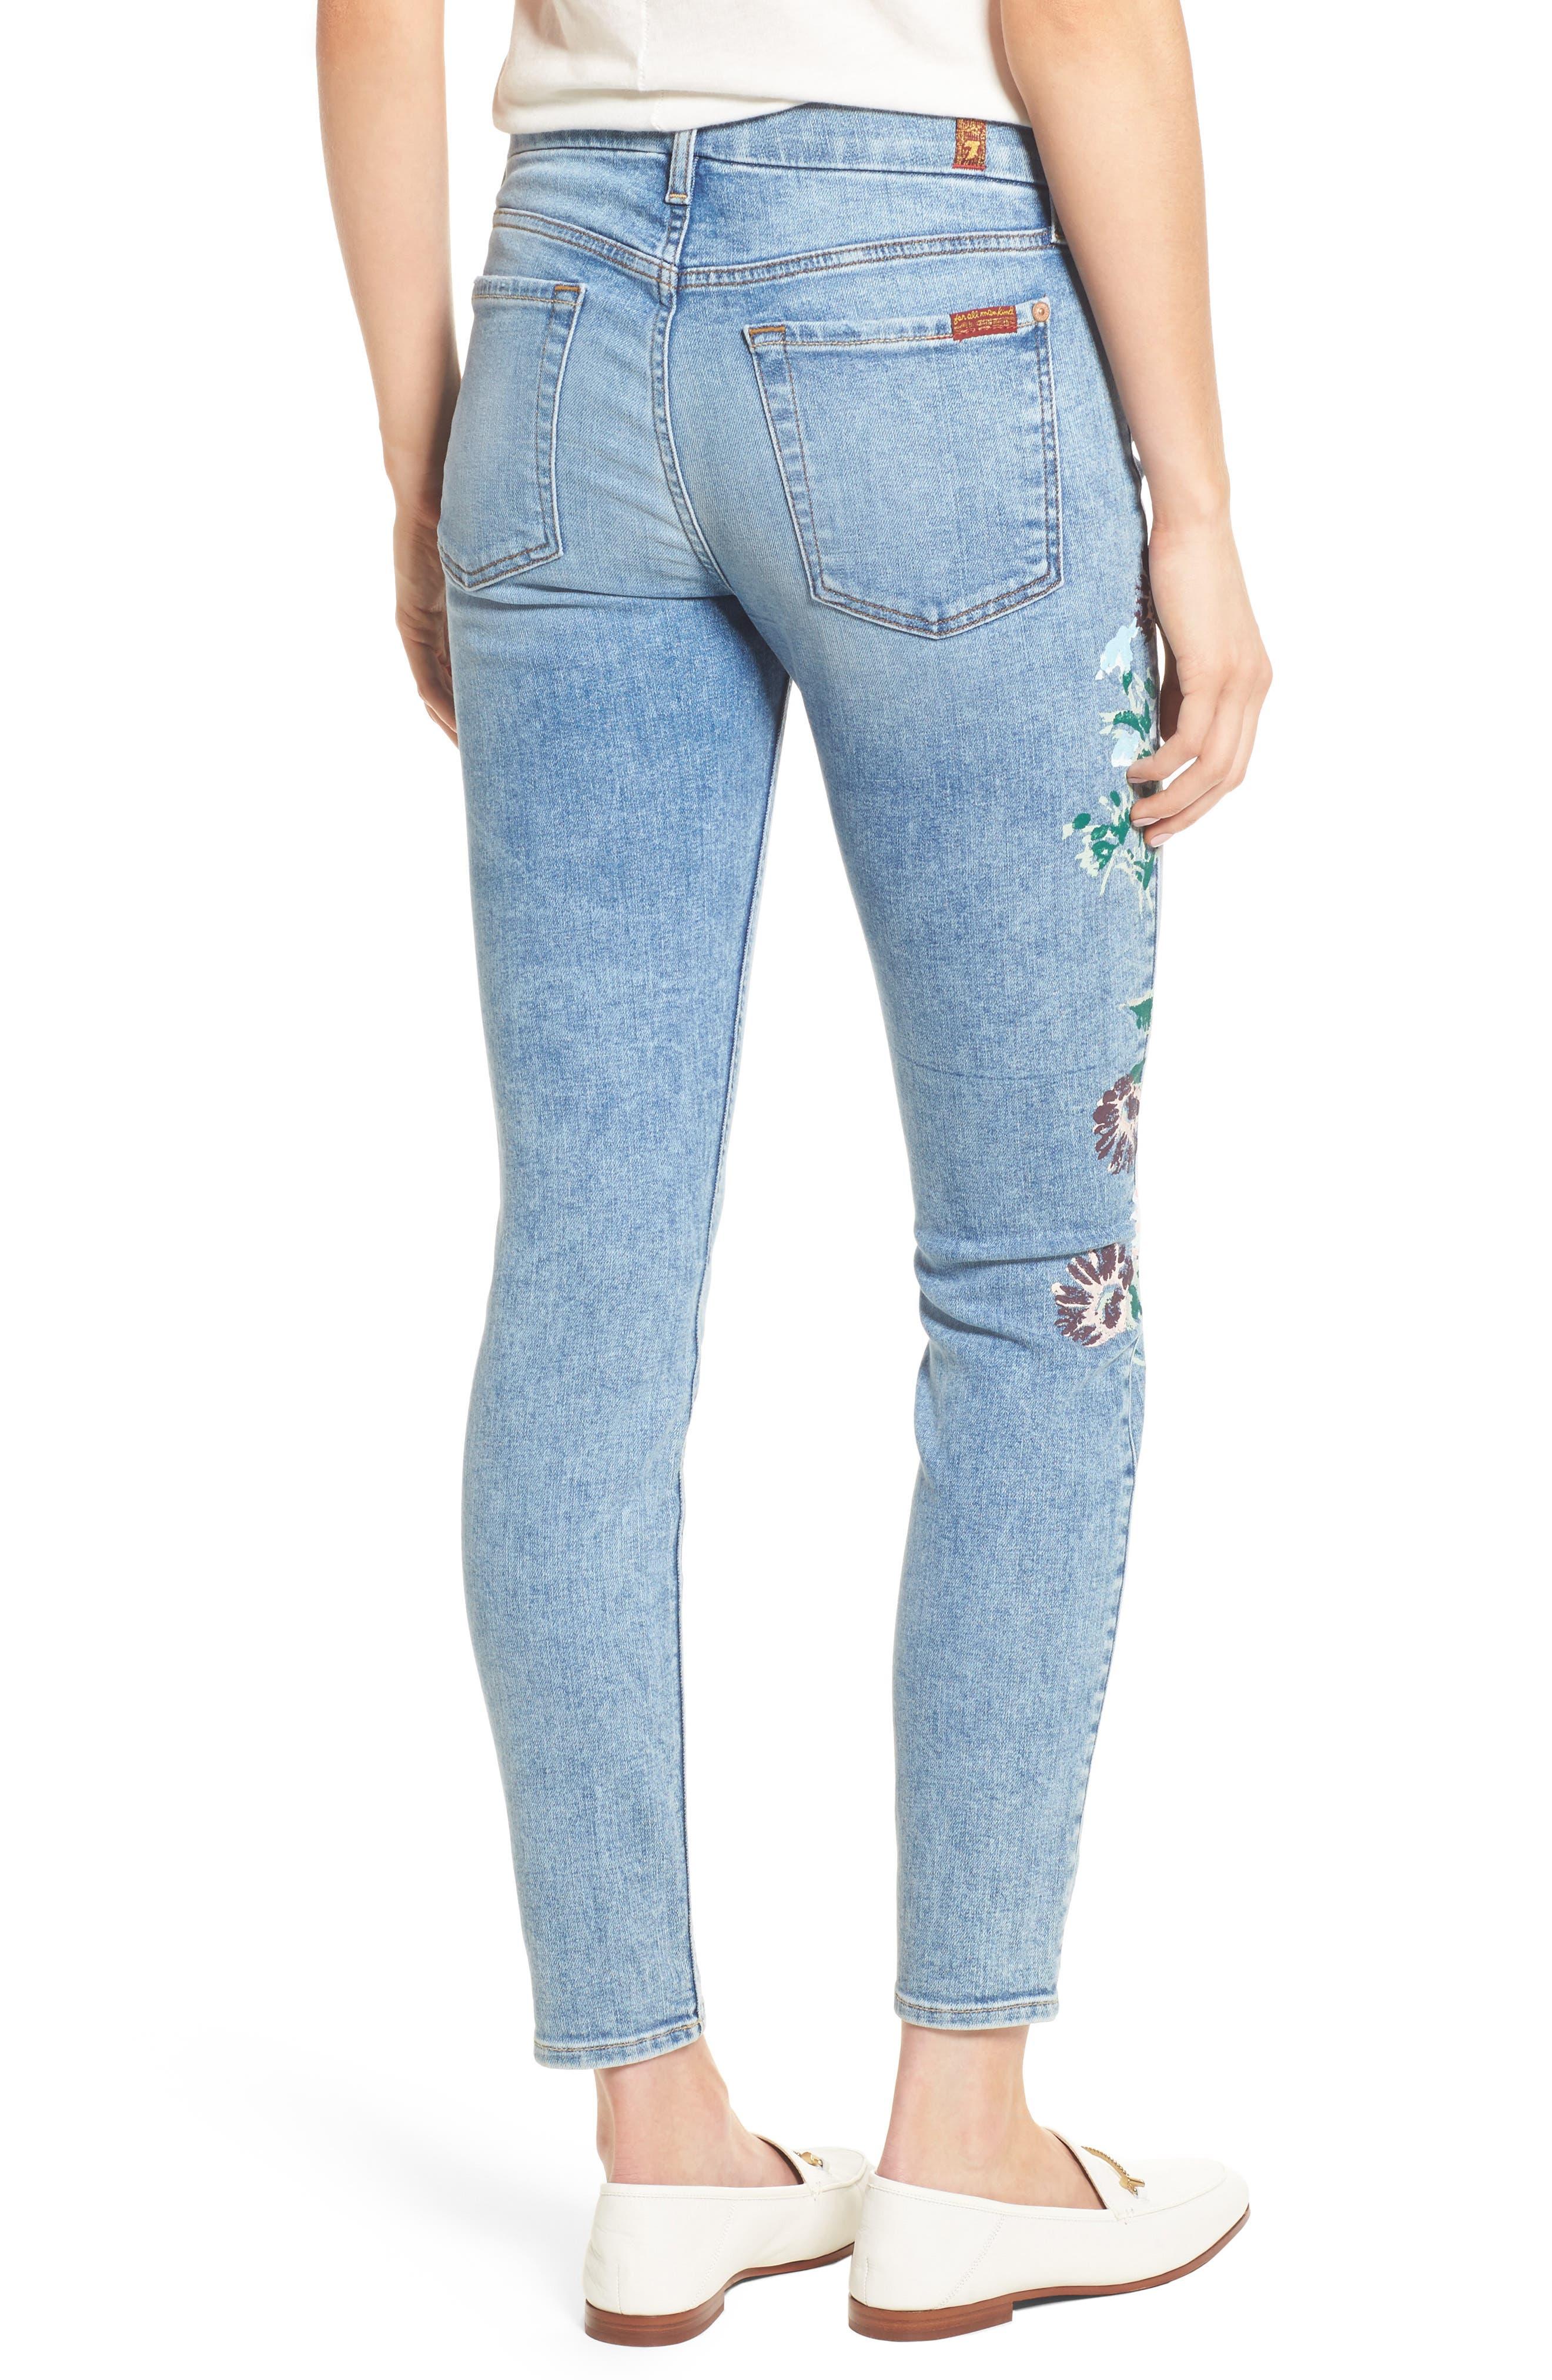 Embellished & Ripped Ankle Skinny Jeans,                             Alternate thumbnail 2, color,                             Radiant Wythe W/ Floral